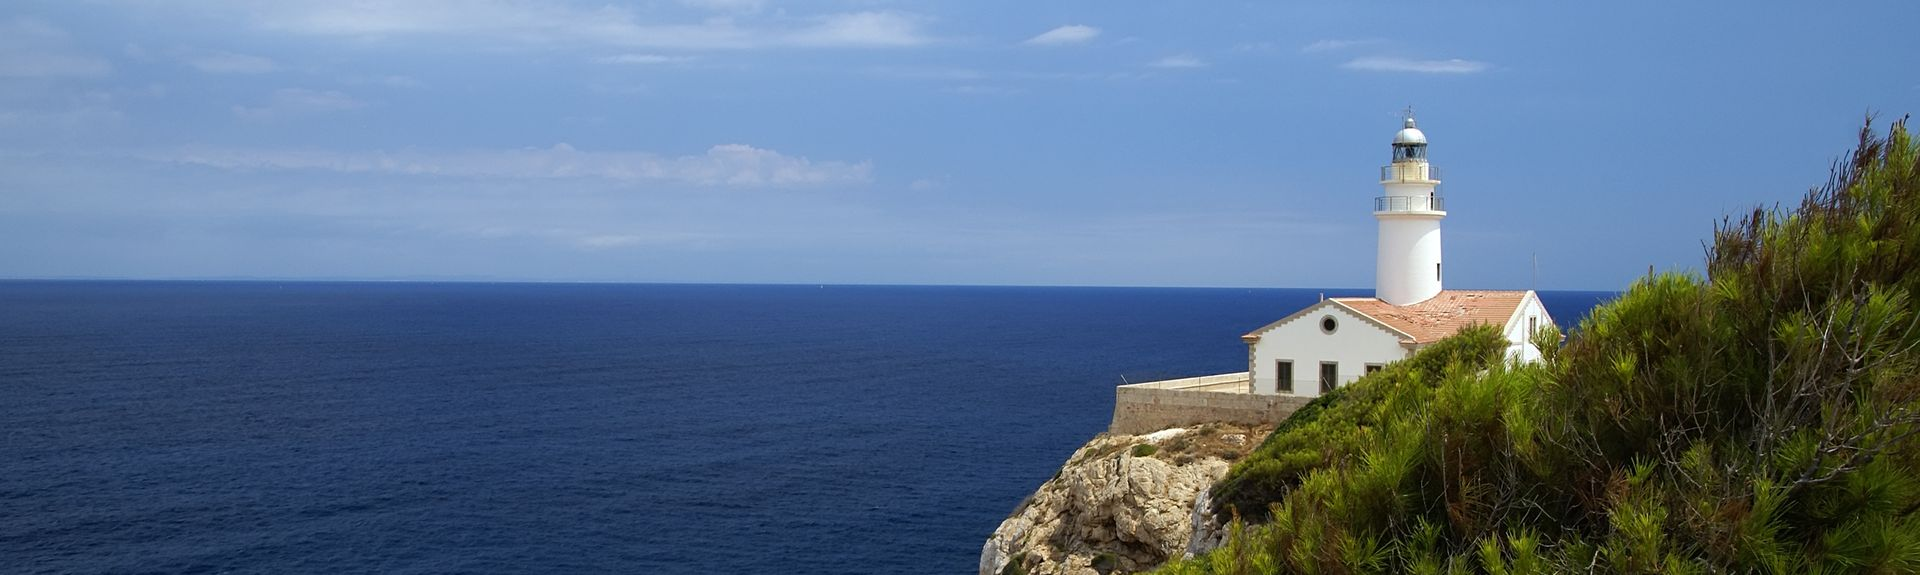 Cala Ratjada, Balearische Inseln, Spanien